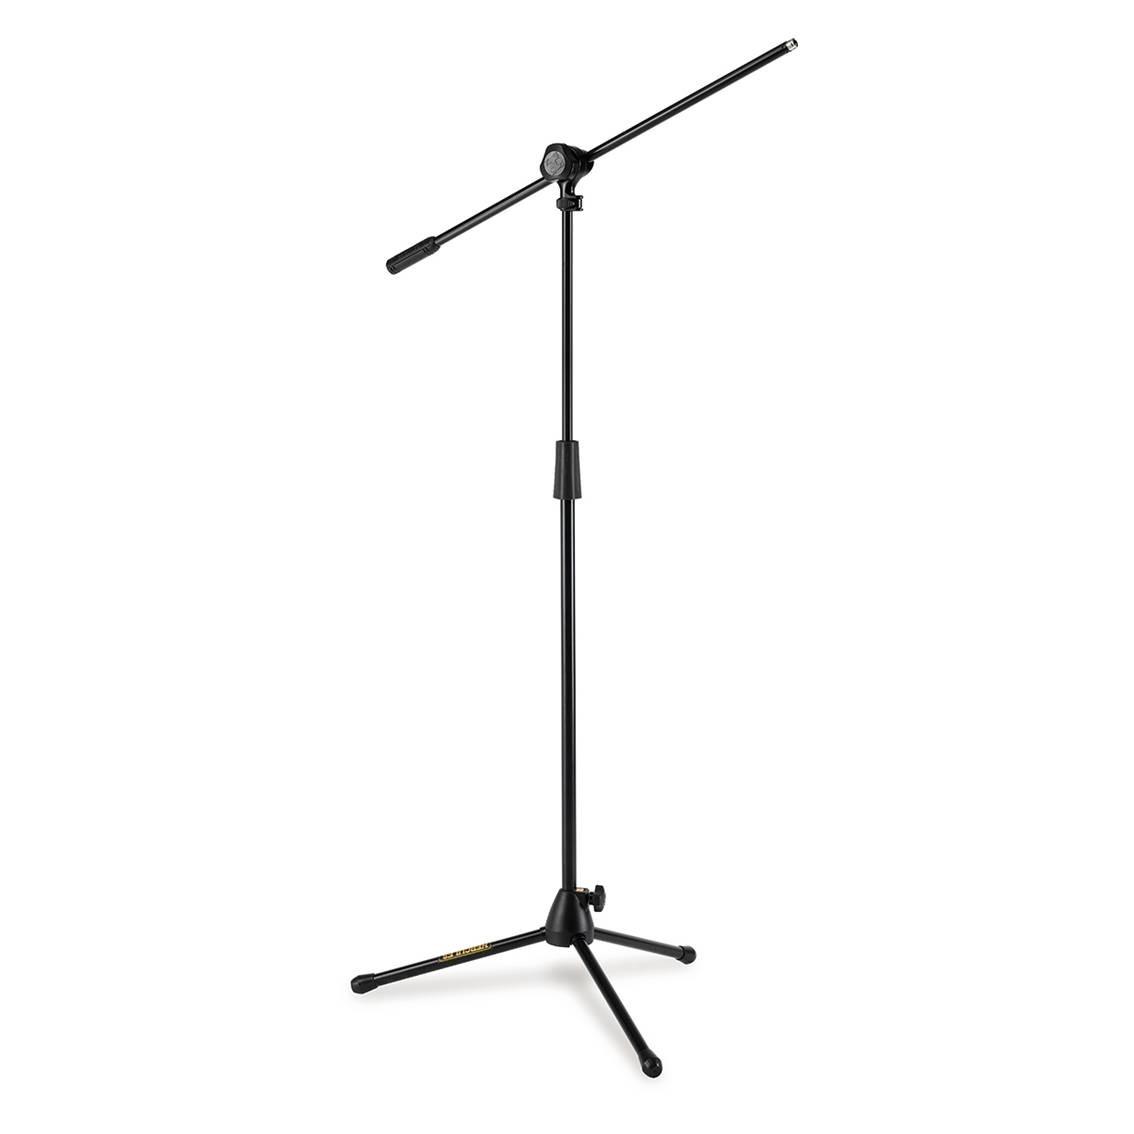 Imagem do produto Pedestal Girafa para Microfone QuickTurn Hercules MS432B